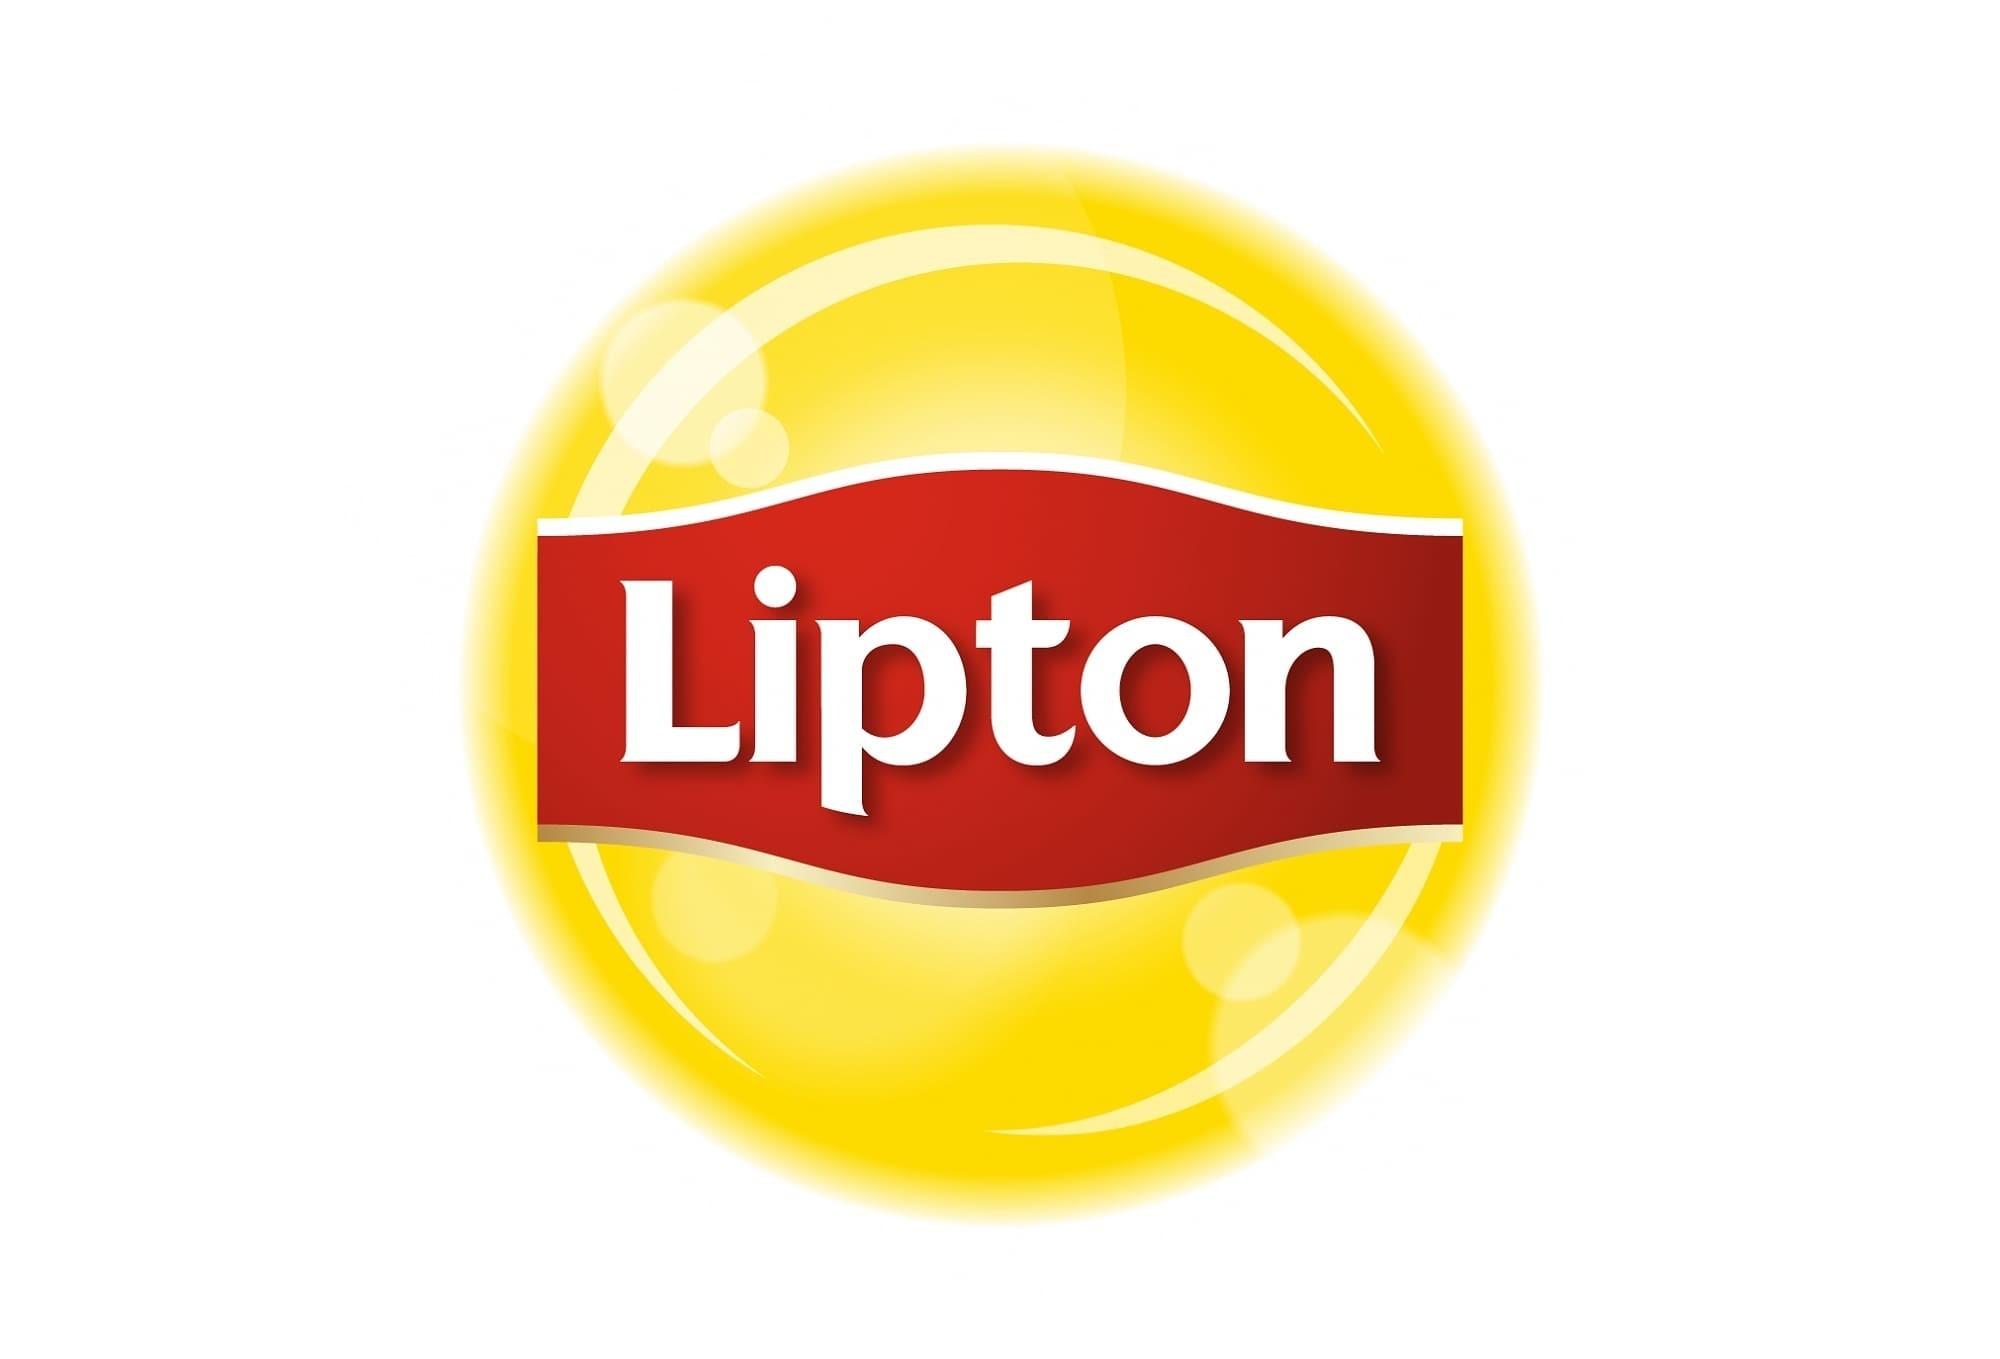 Soup, Tea & Mousse Mix by Lipton, Pure Leaf & Knorr, 10,/664 Cases, Ext. Retail $52,258, Newville, PA